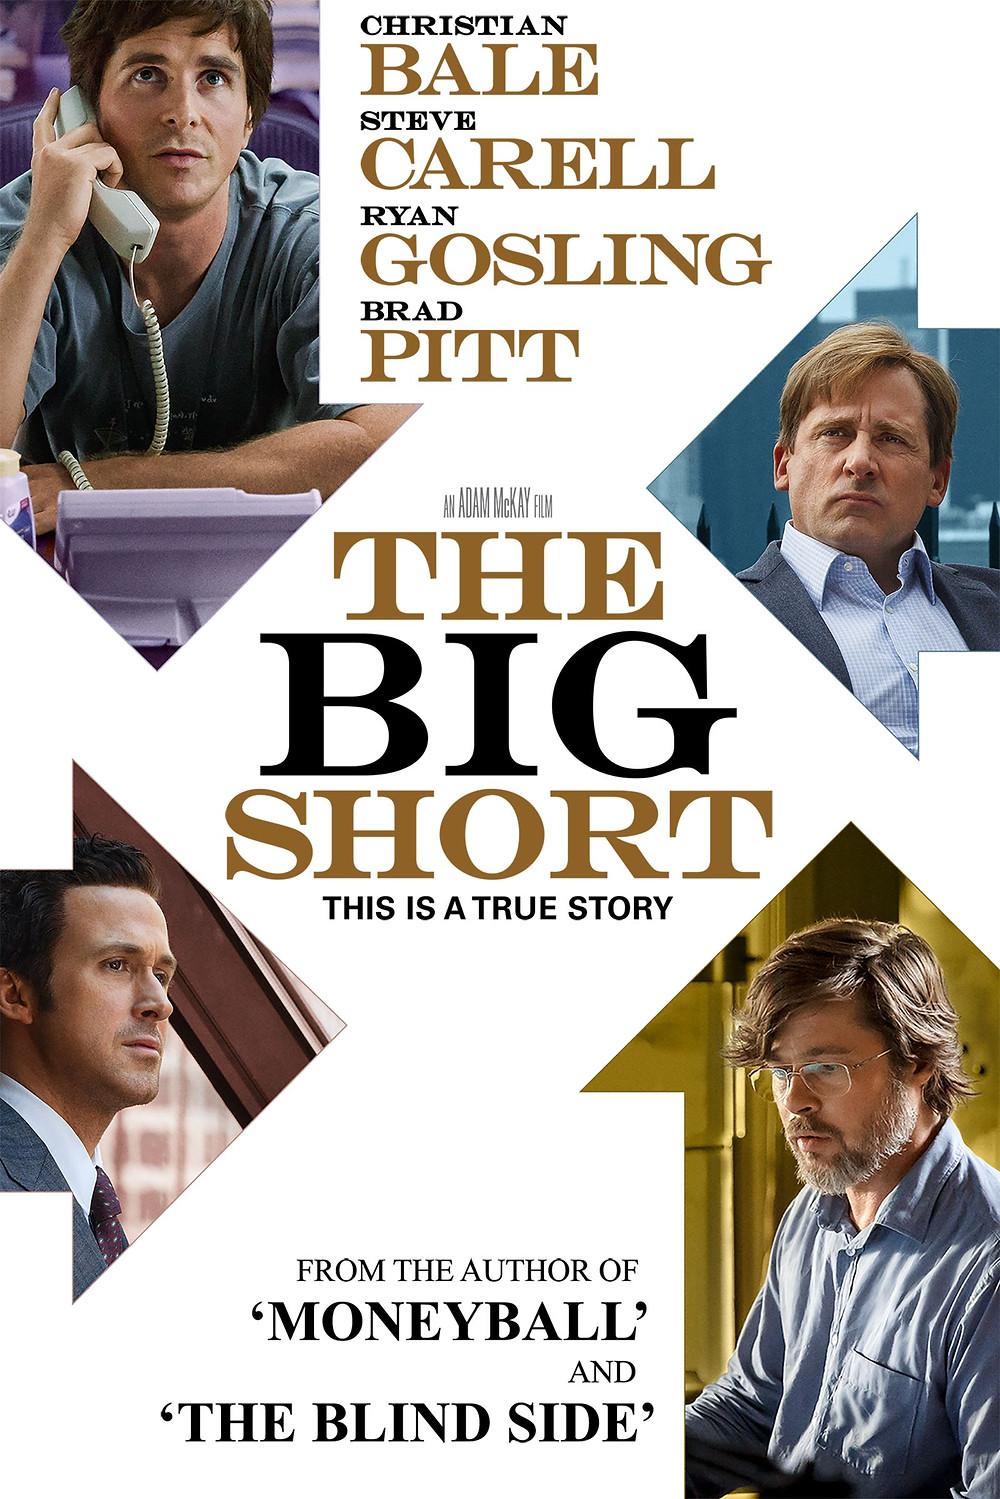 The big short movie poster. The big short movie explanation